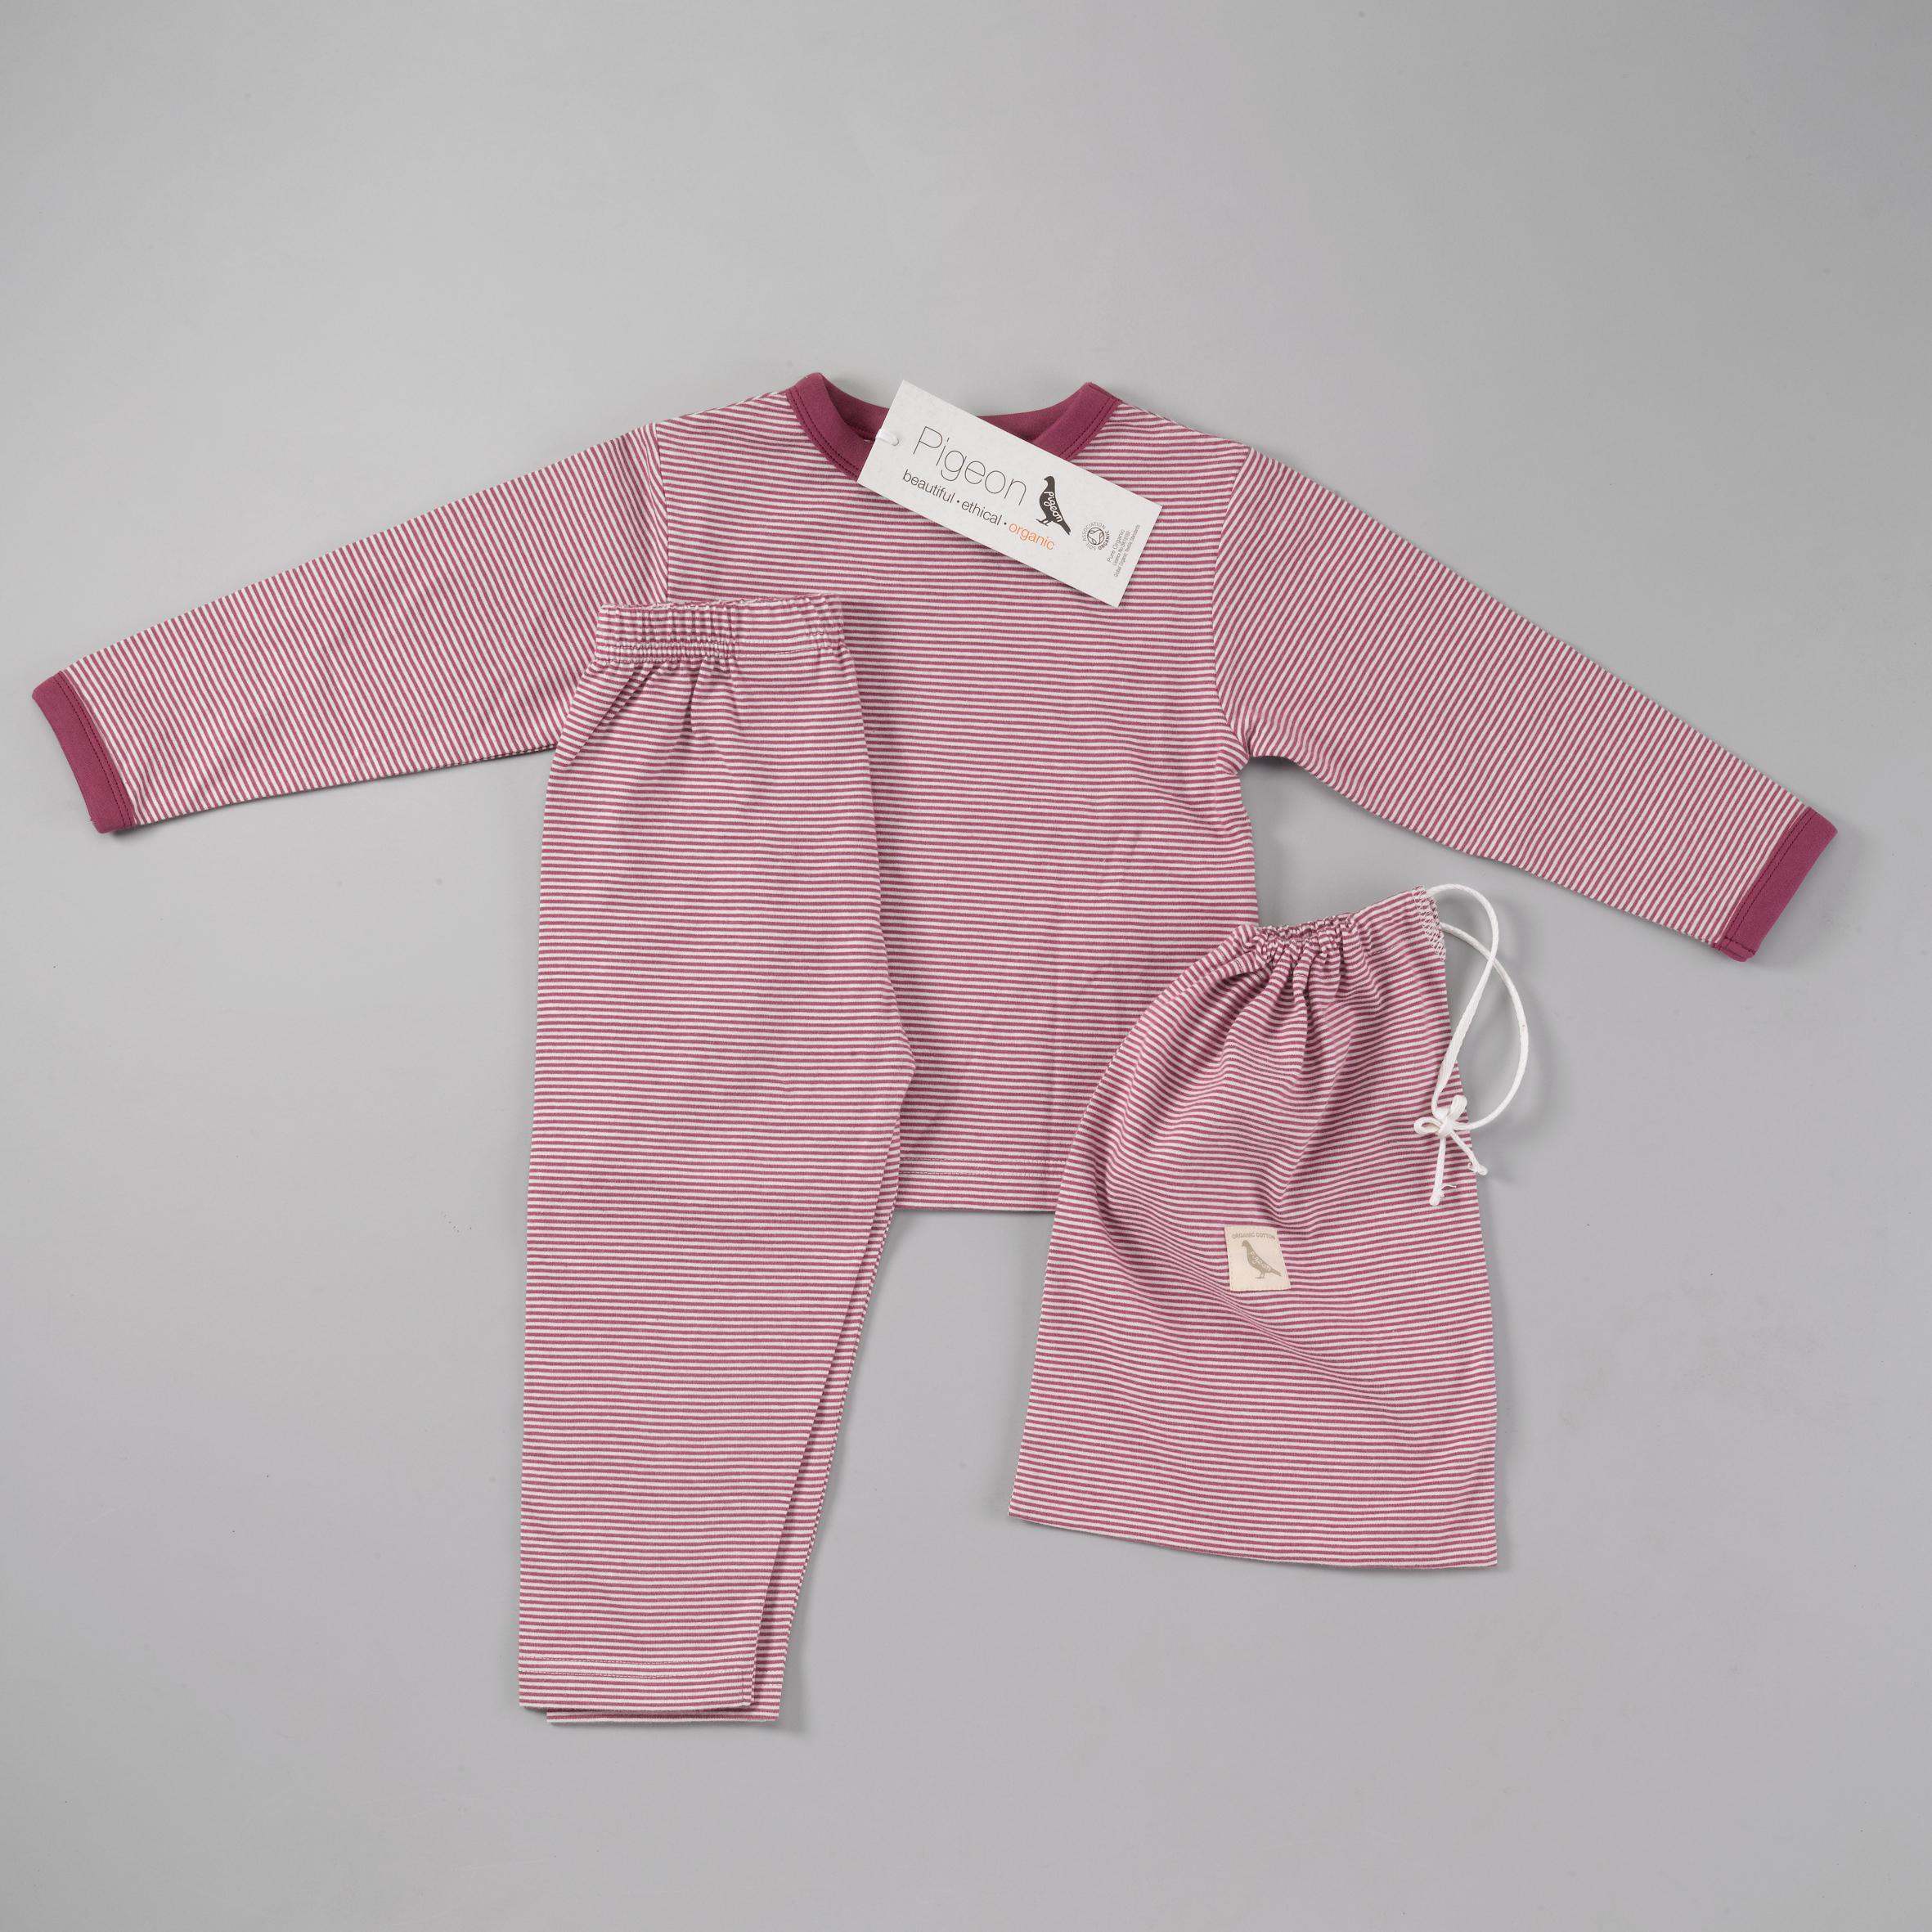 Pigeon - Pyjamas in a bag - fig fine stripe